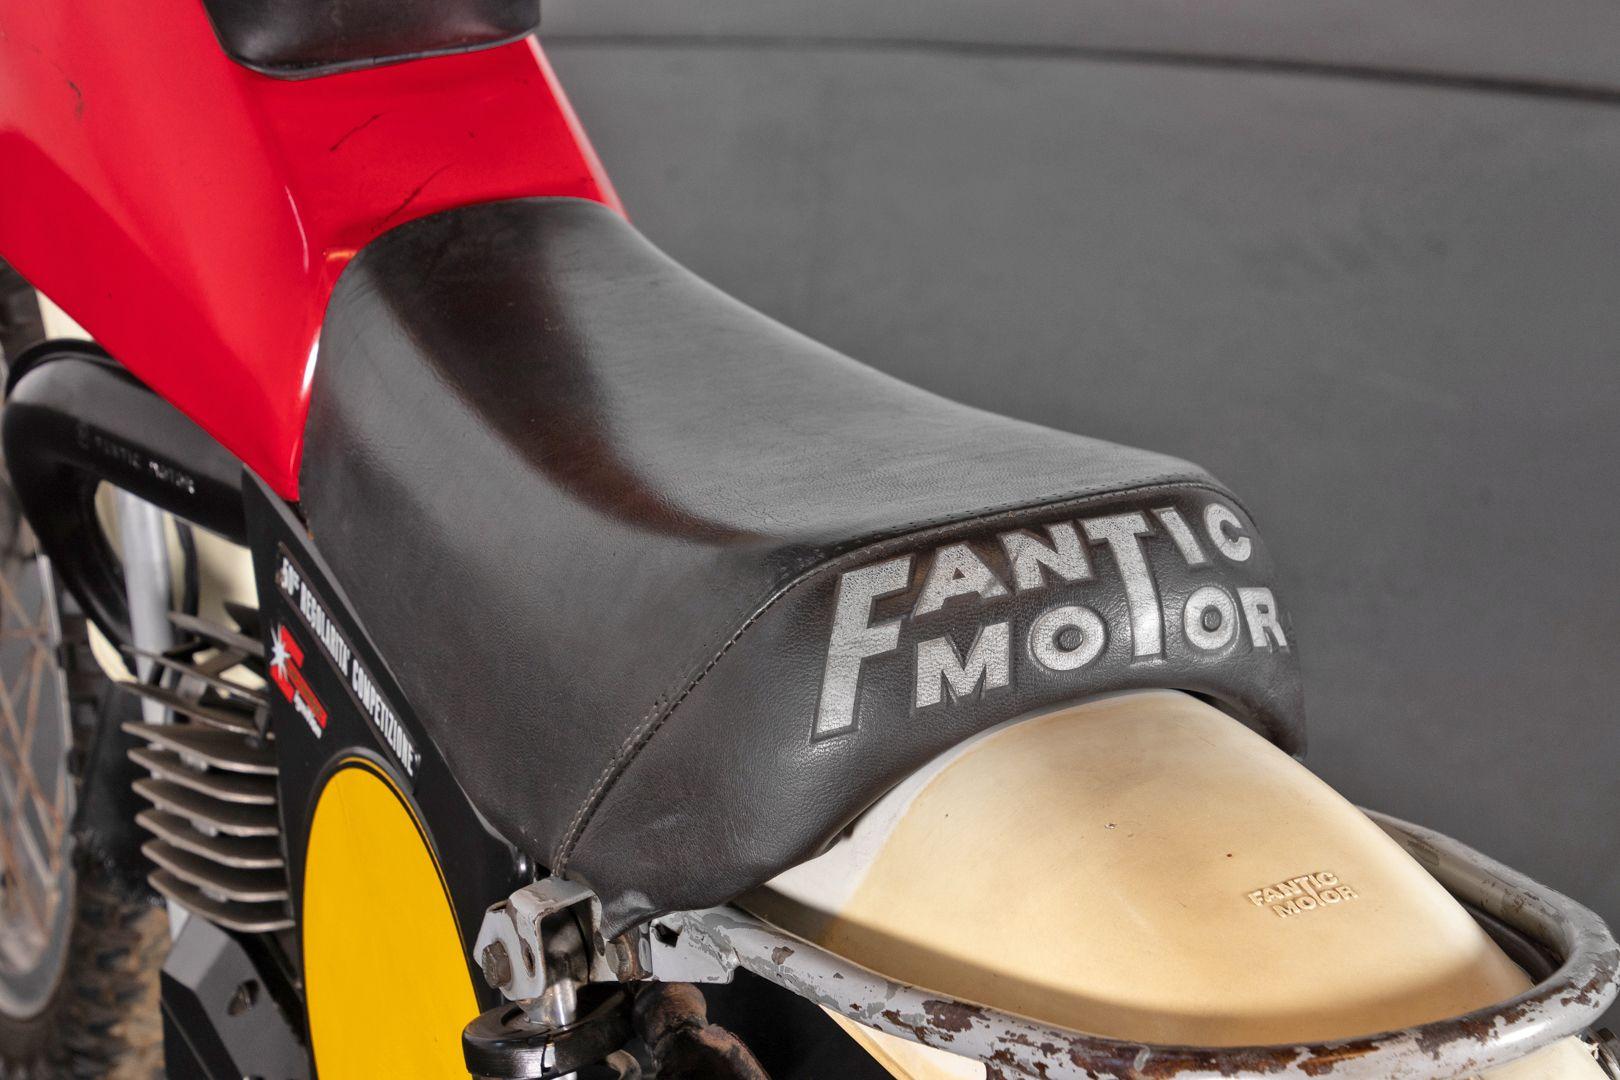 1976 FANTIC MOTOR TX 160 50533